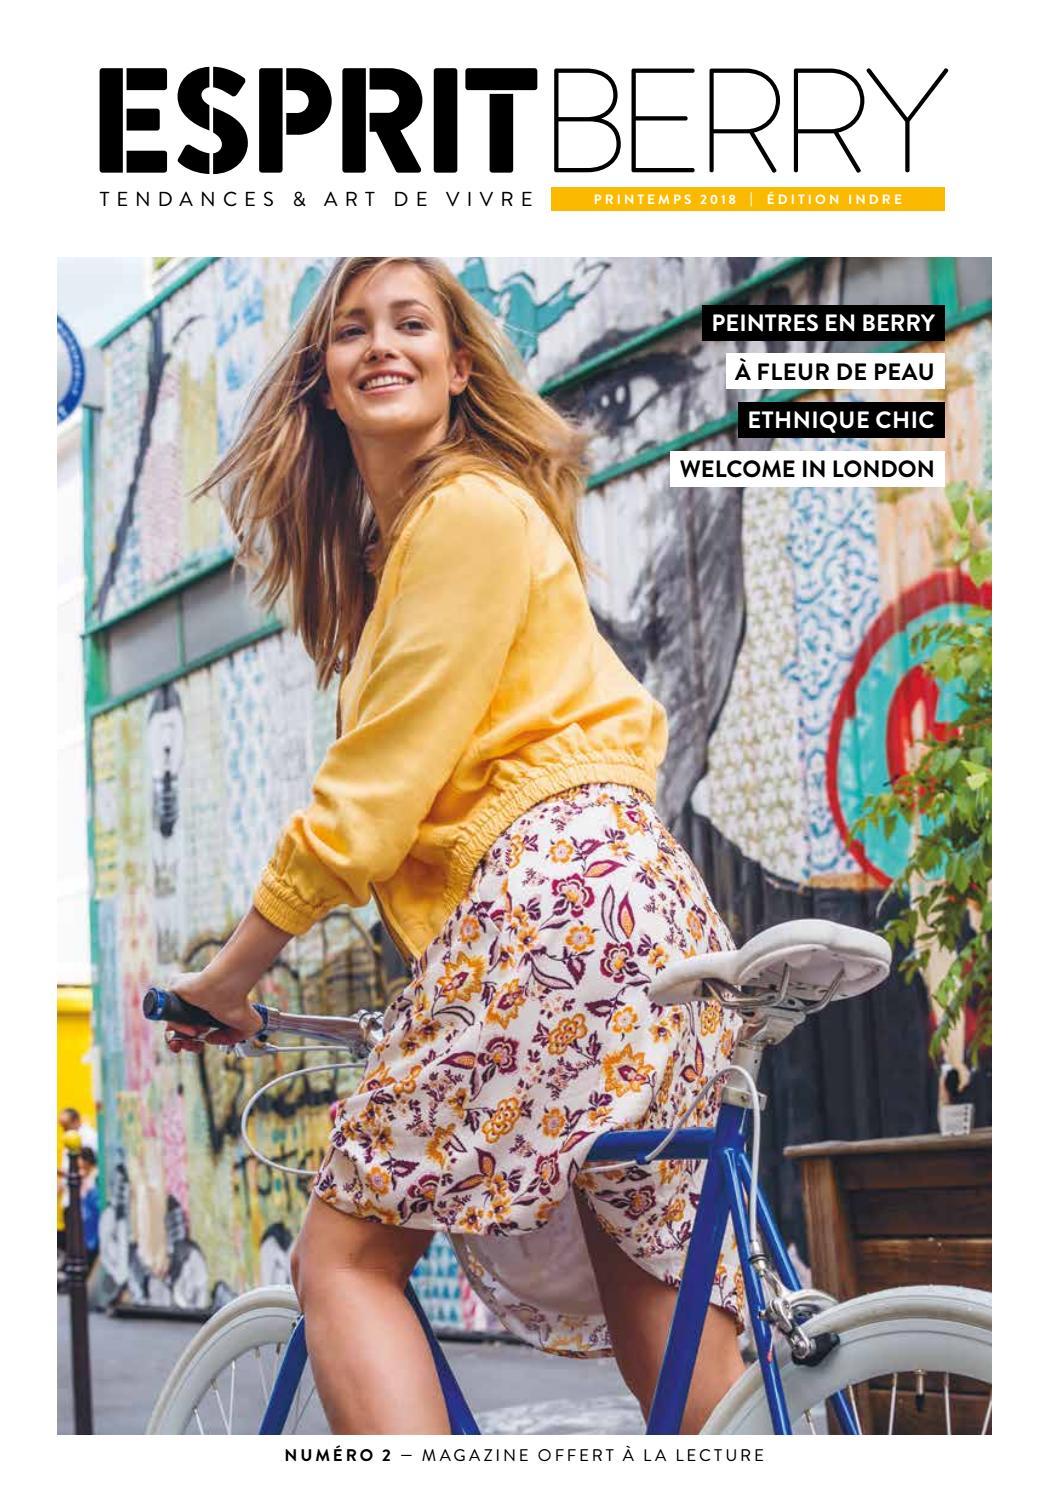 Esprit Berry  2 - Printemps 2018 by Esprit Berry - issuu d83117856547